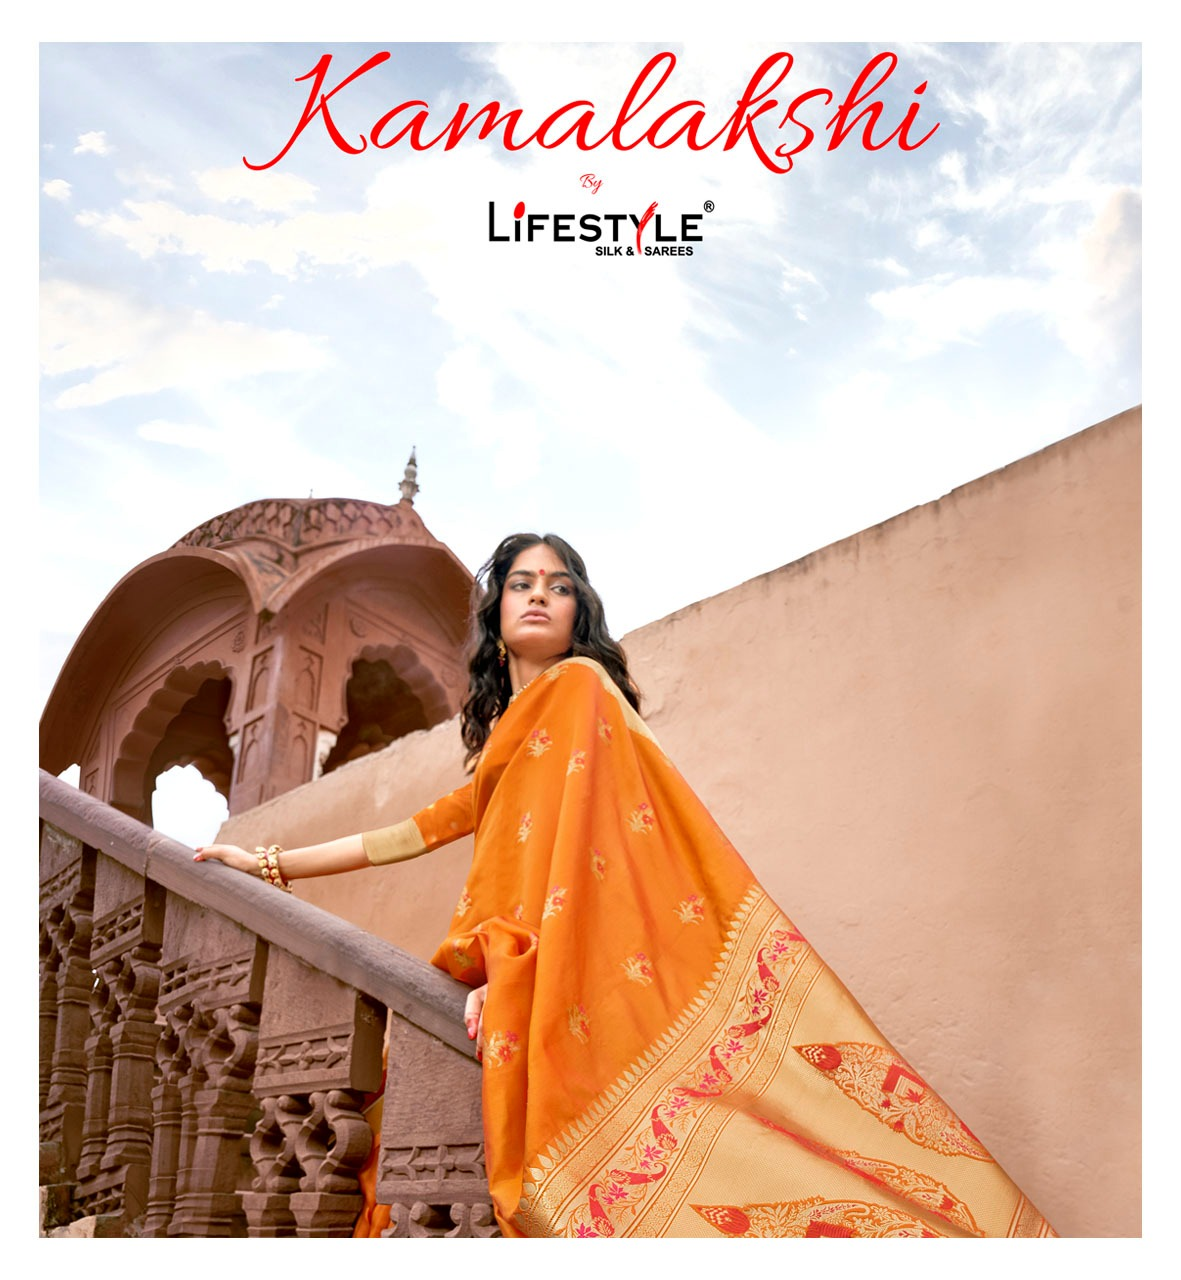 Lifestyle Kamalakshi Designer Lichi Rich Pallu Partywear Sarees Wholesale